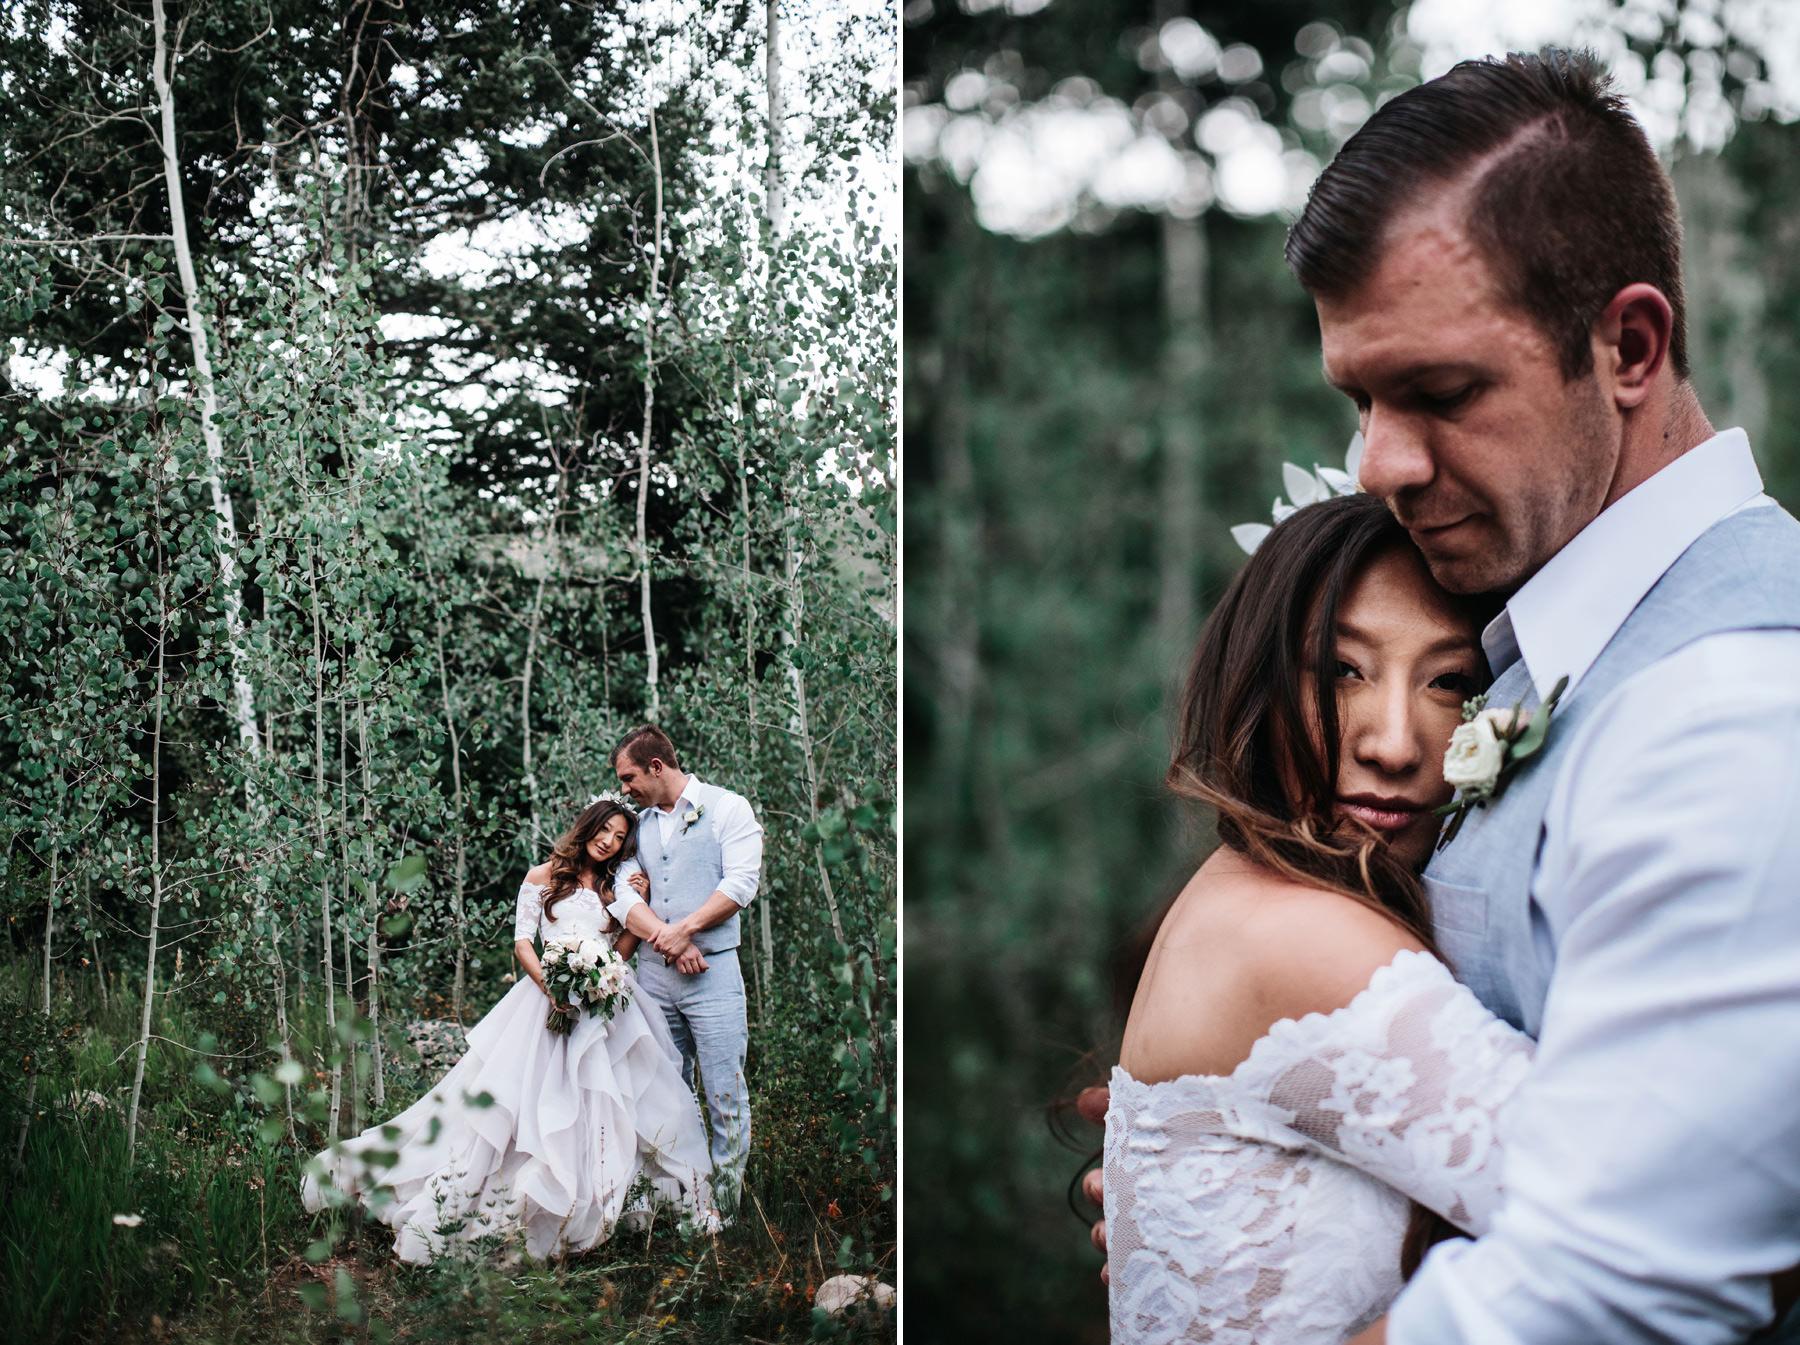 Vail Colorado Wedding Deck_ Kindling Wedding Photography78.JPG